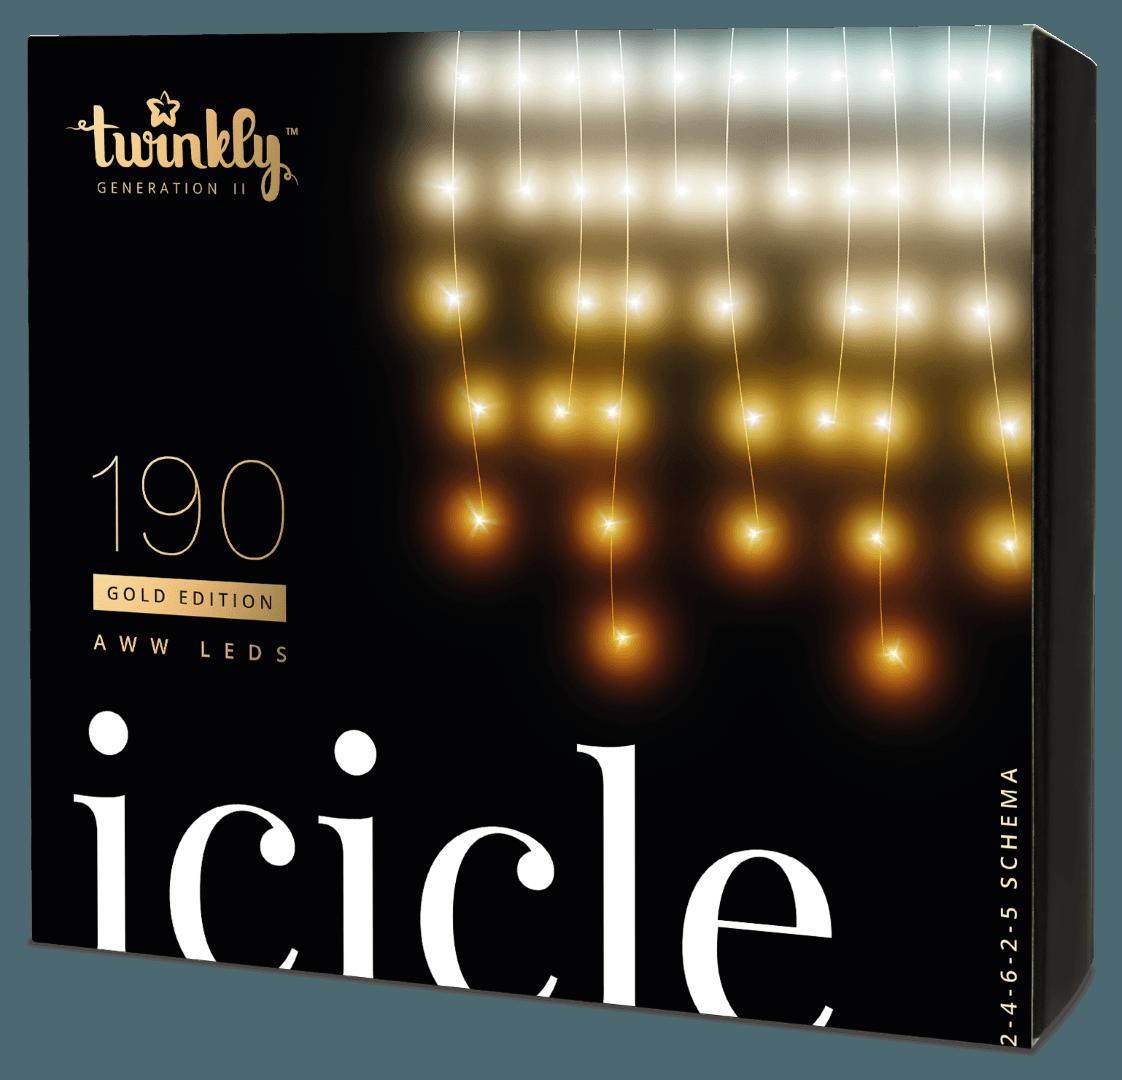 Twinkly 190 AWW LEDs Icicle Lights - Generation II